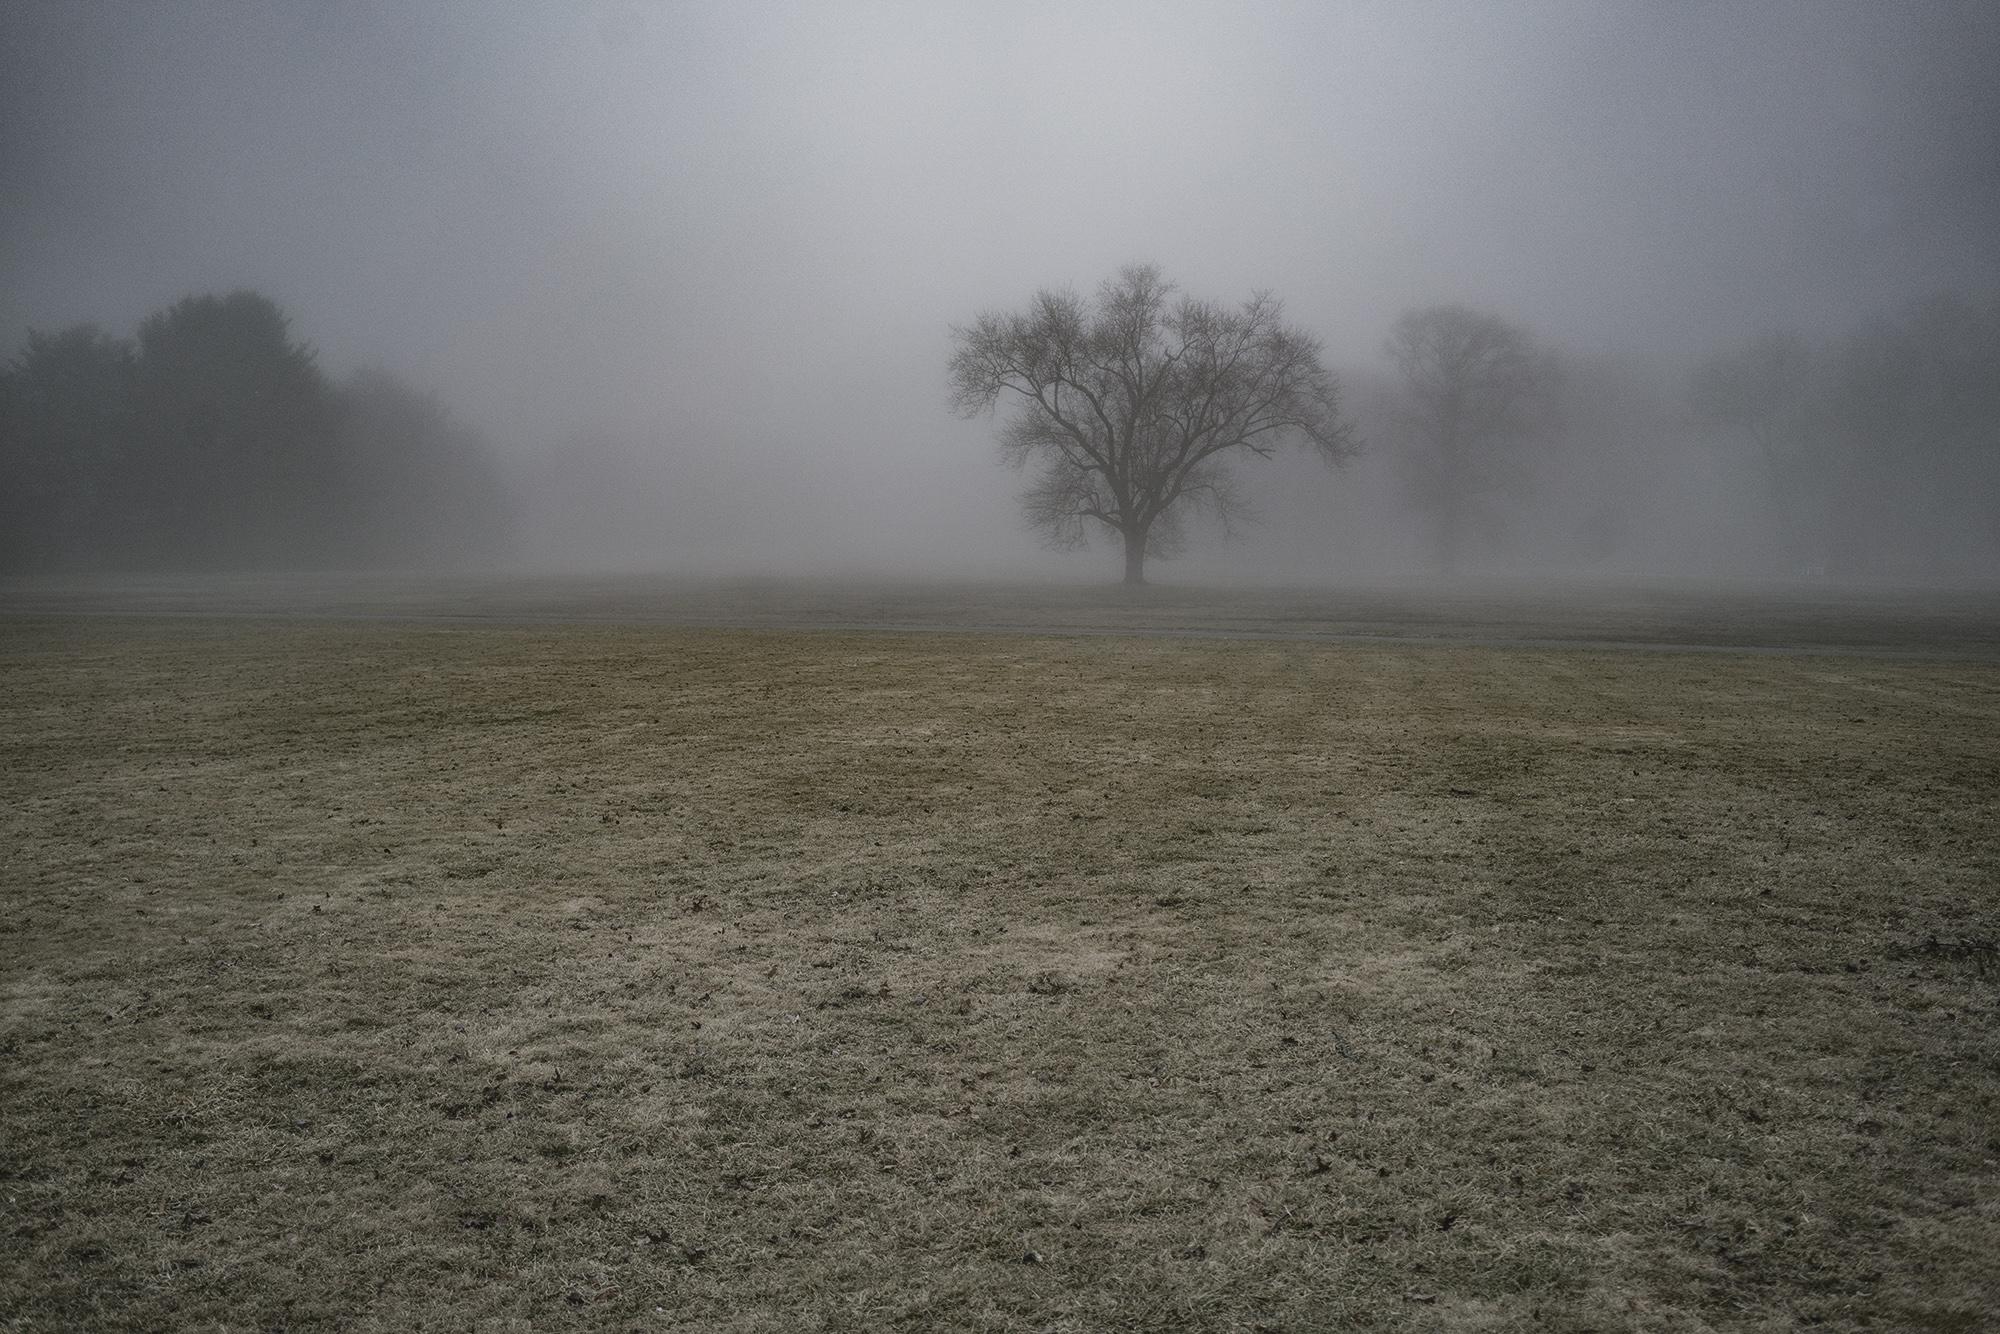 New York_Long_Island_Foggy_Lone_Tree-034.jpg